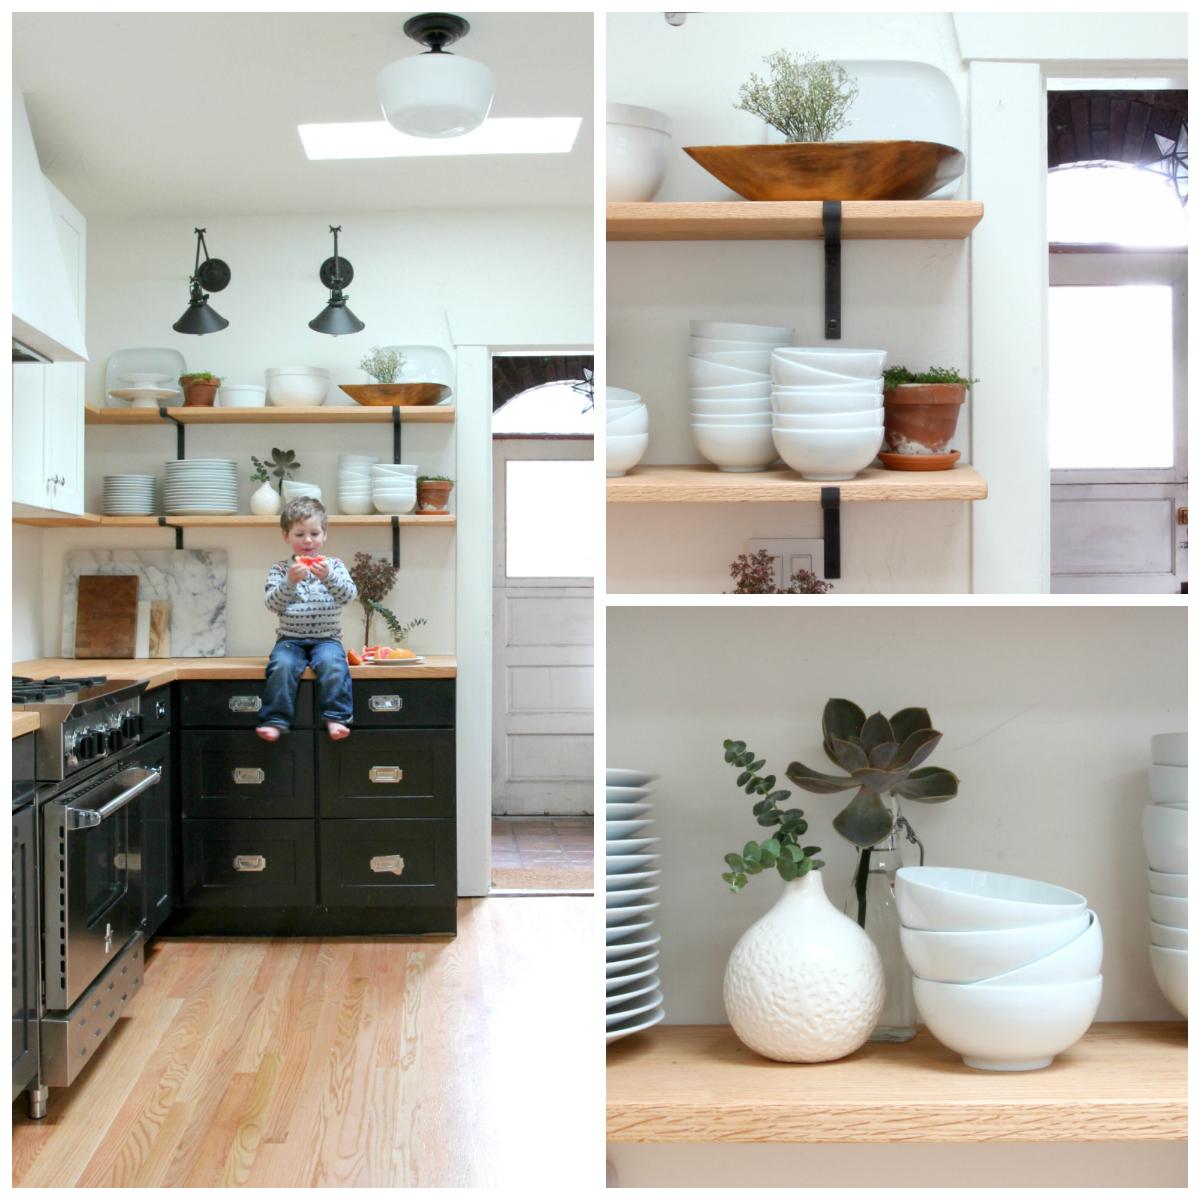 The Grit and Polish - Dexter Kitchen Renovation Shelf Details Collage